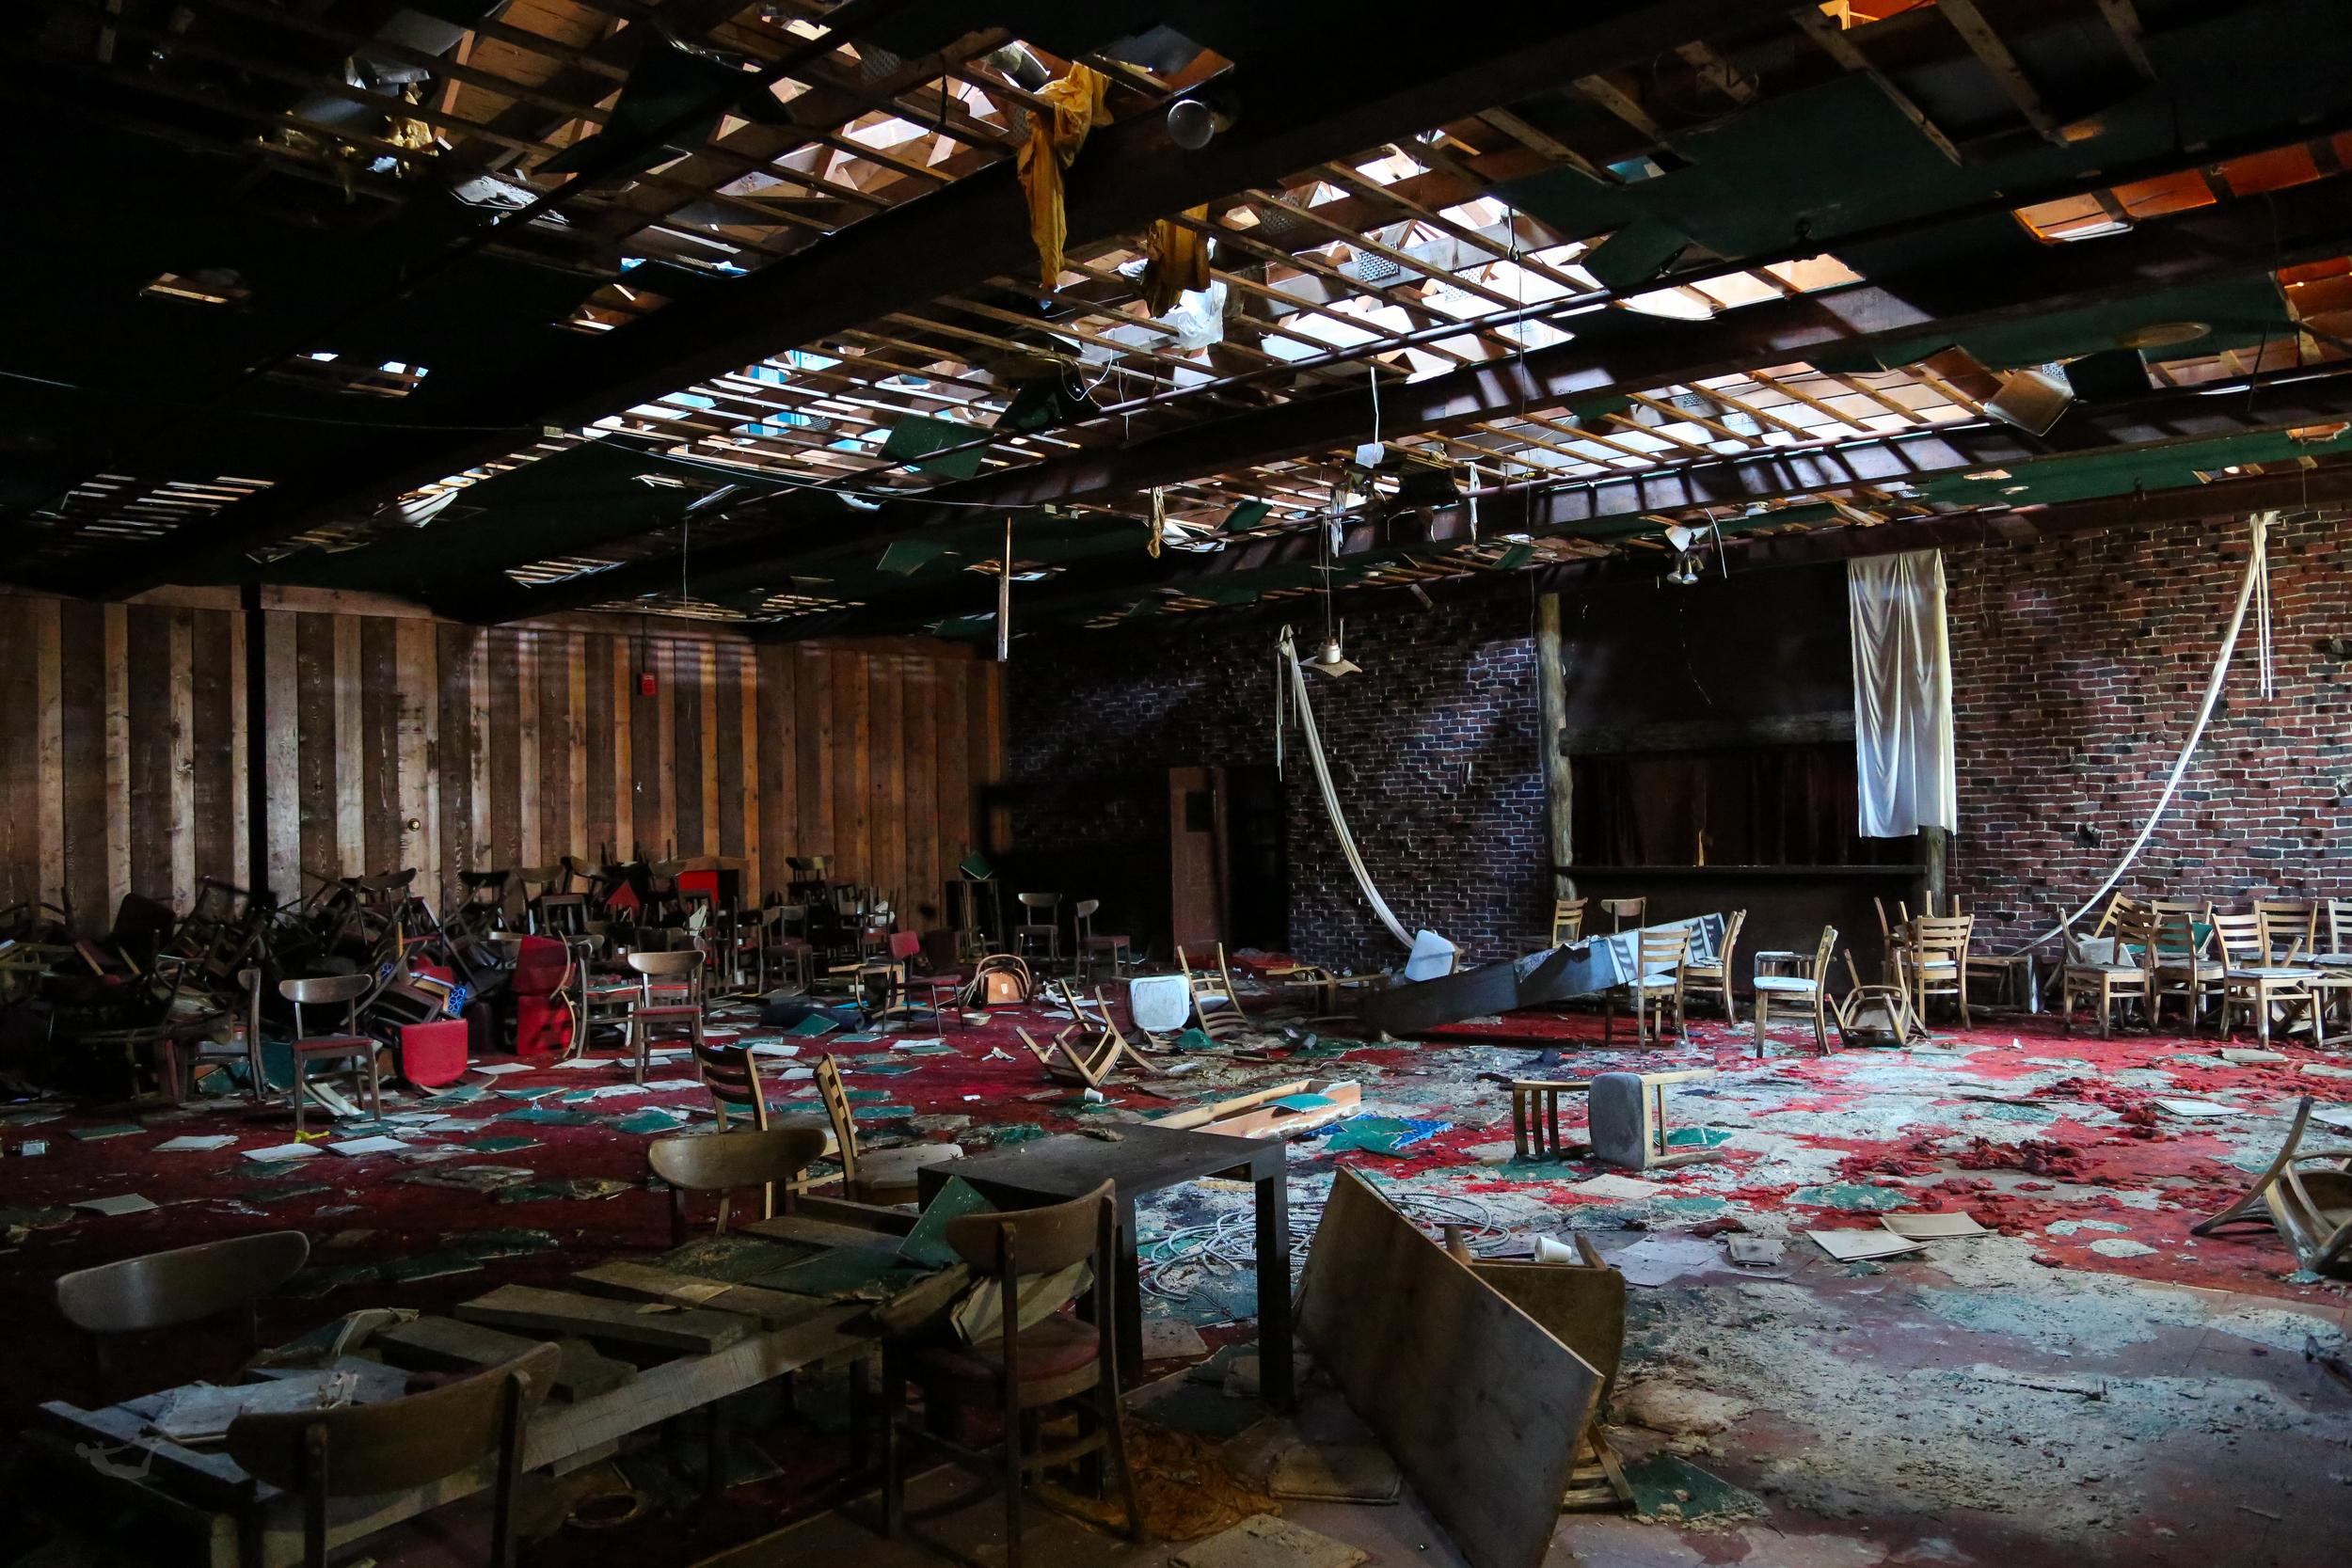 Abandoned.Building.Dinner.Hall.jpg